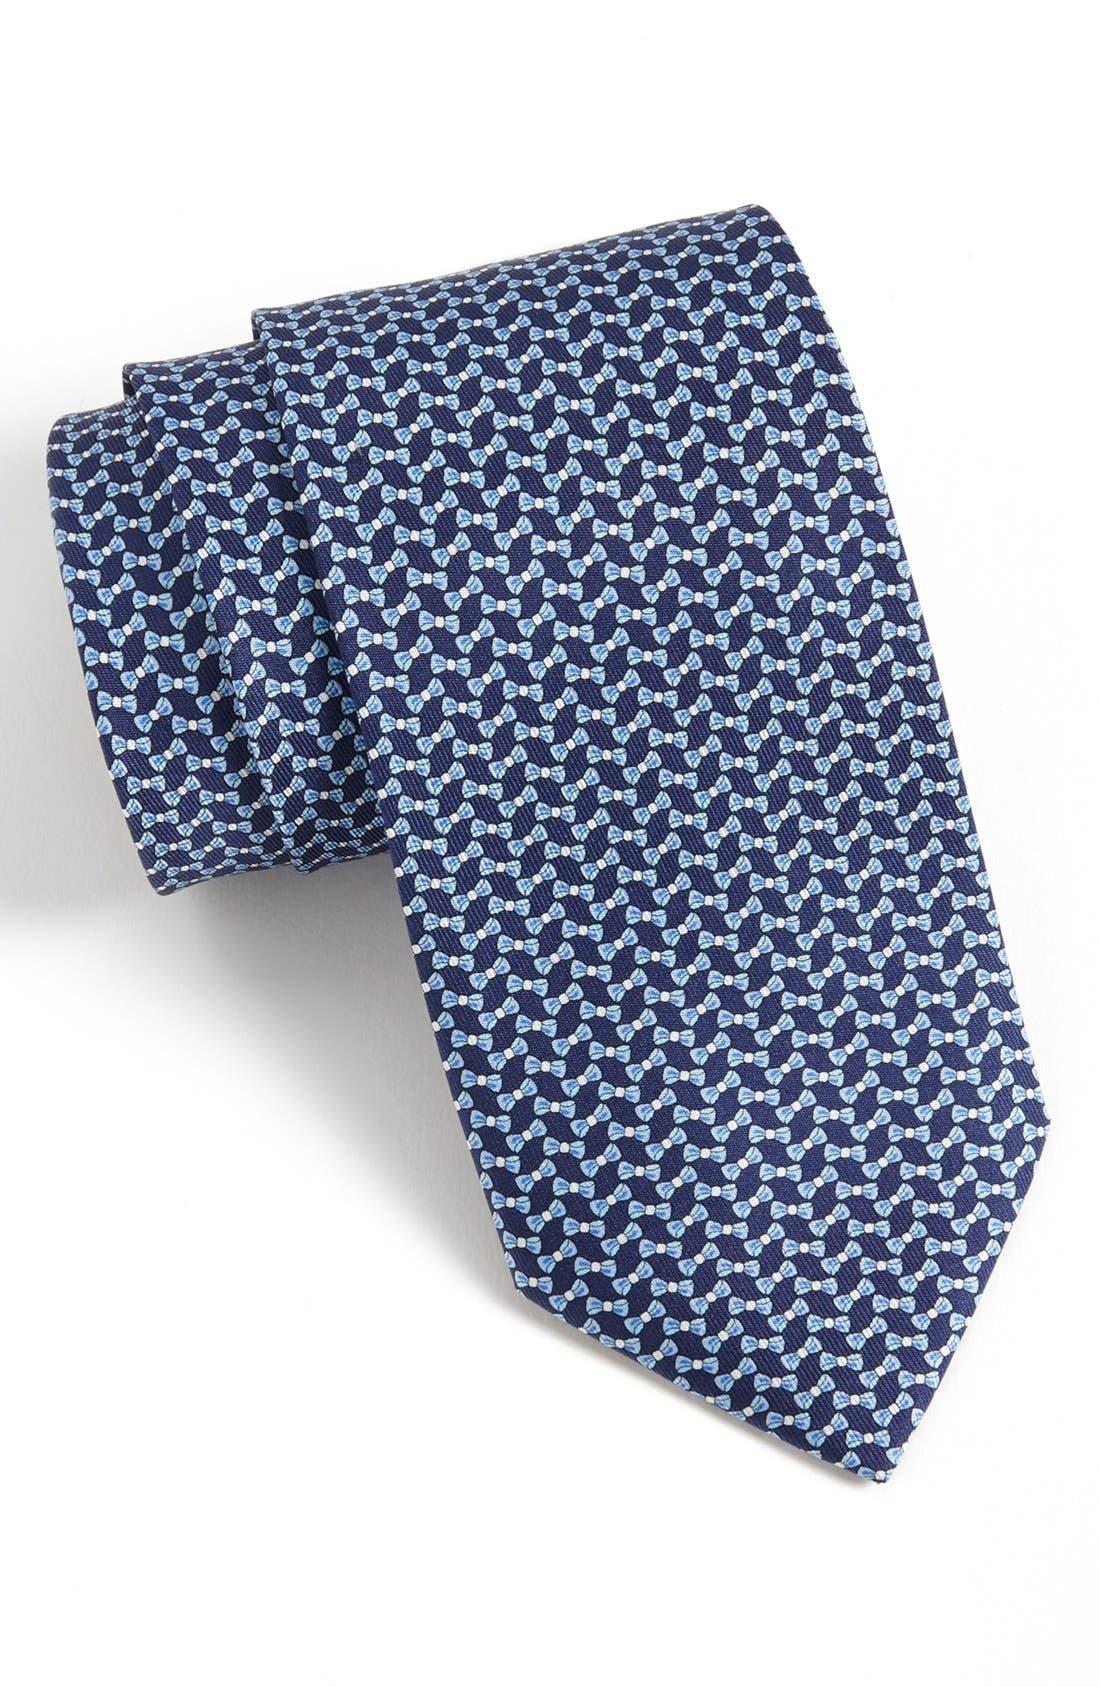 Main Image - Salvatore Ferragamo Bow Print Silk Tie